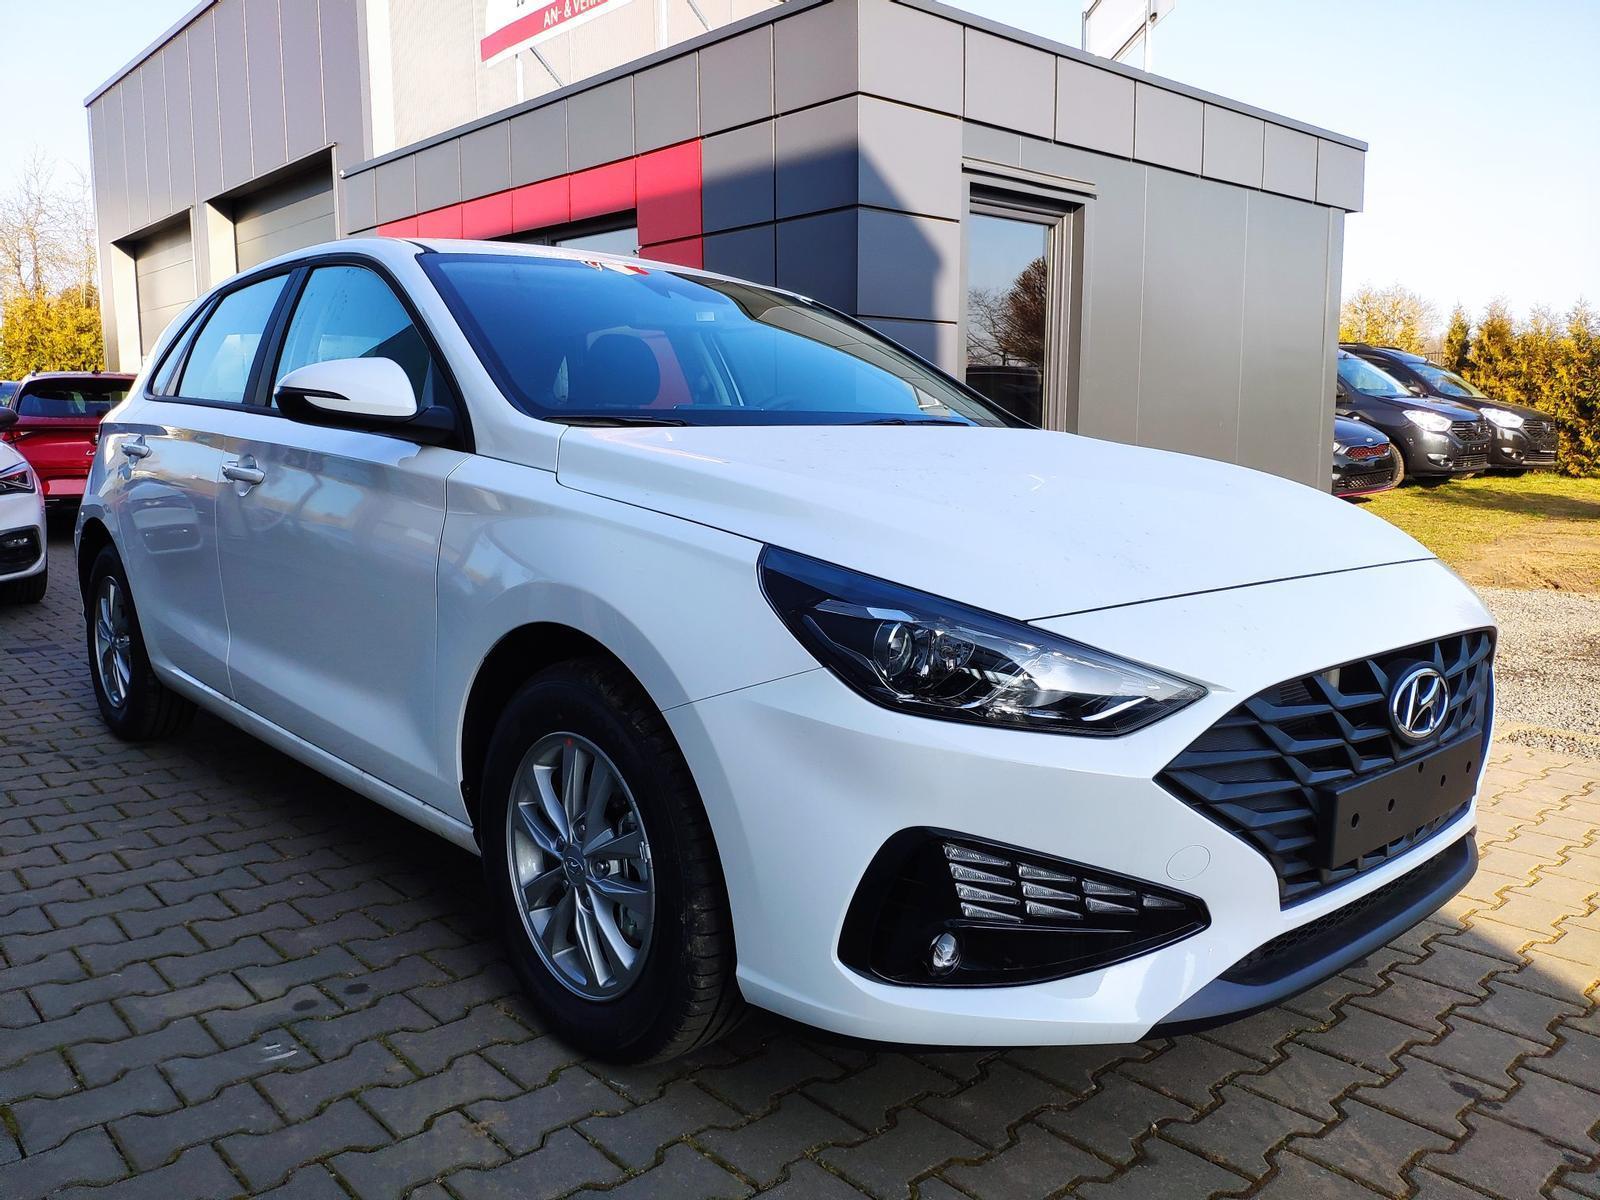 Hyundai i30 neues Modell! *App-Connect*Kamera*Klima*